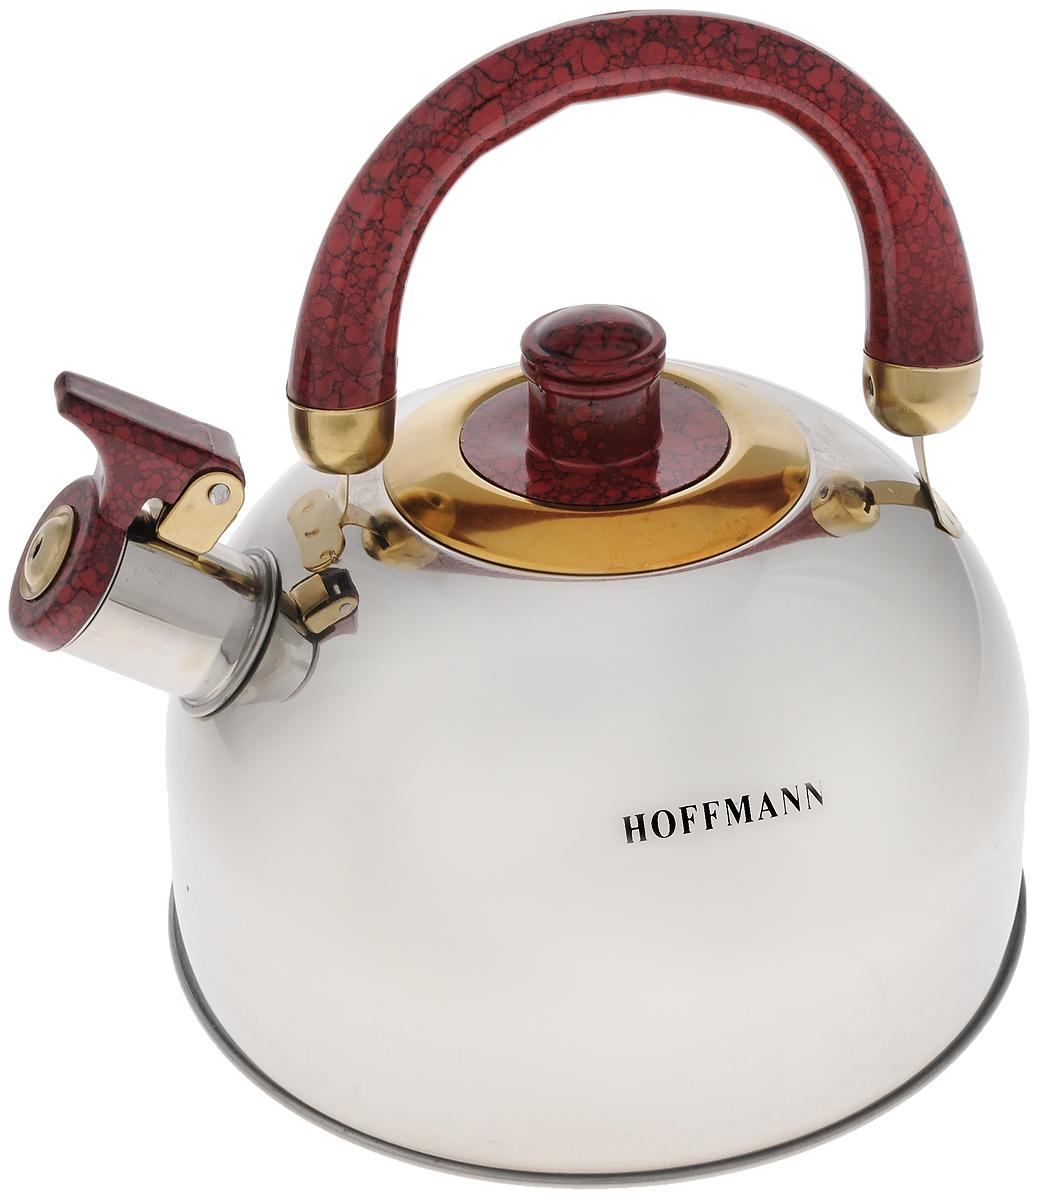 Чайник Hoffmann, со свистком, 2,5 л. НМ 5520-4НМ 5520-4